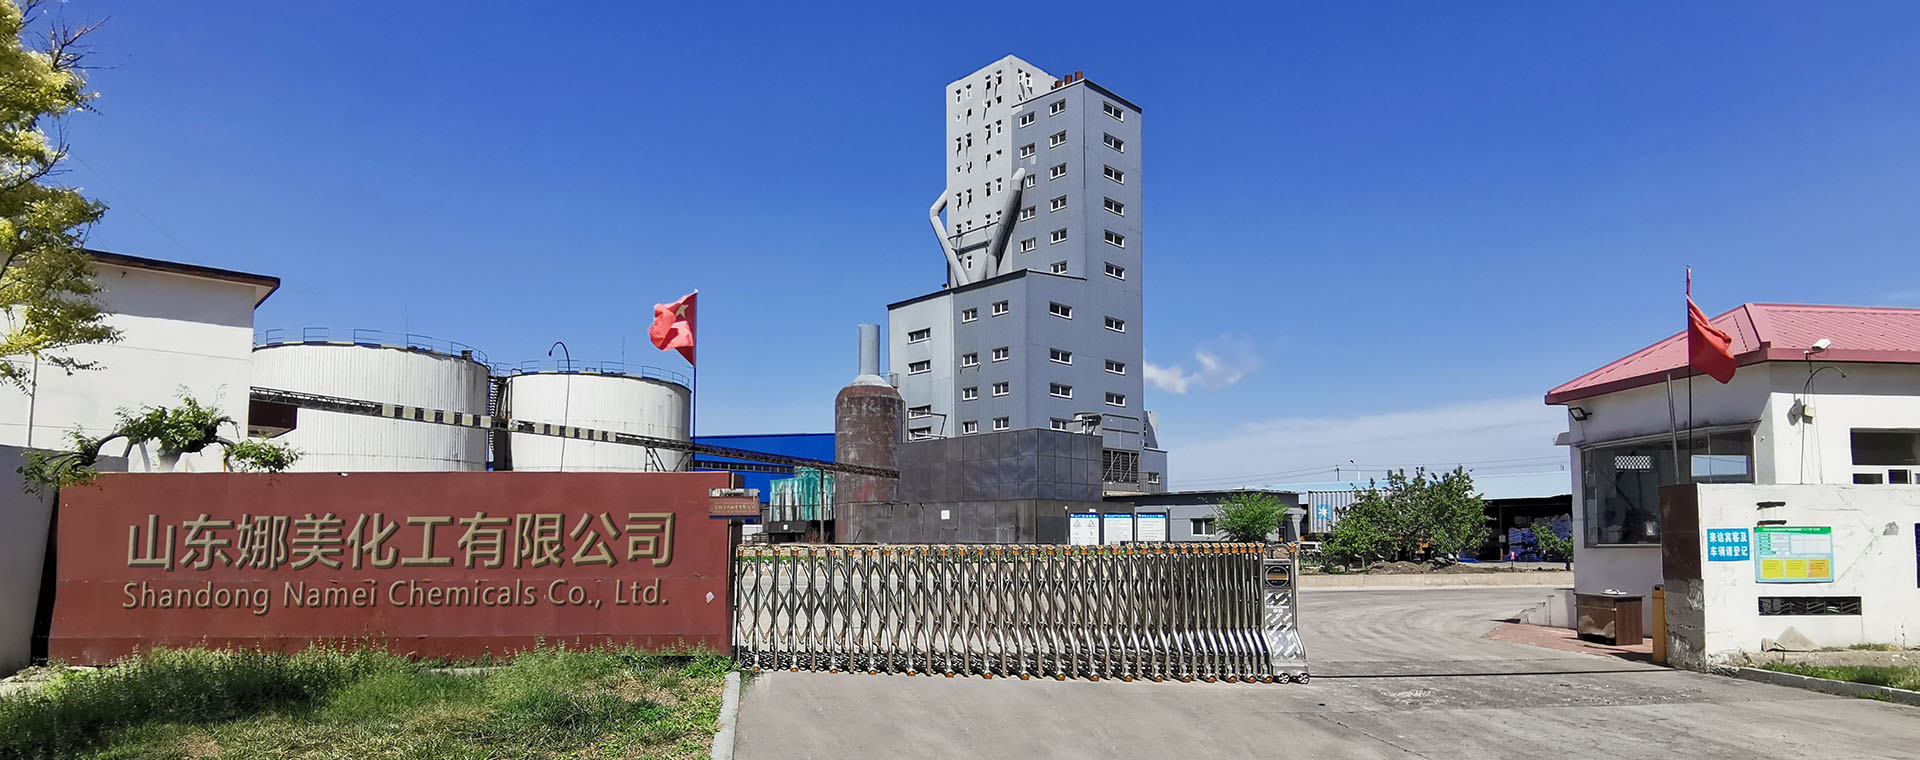 Jiahengyuan chemicals